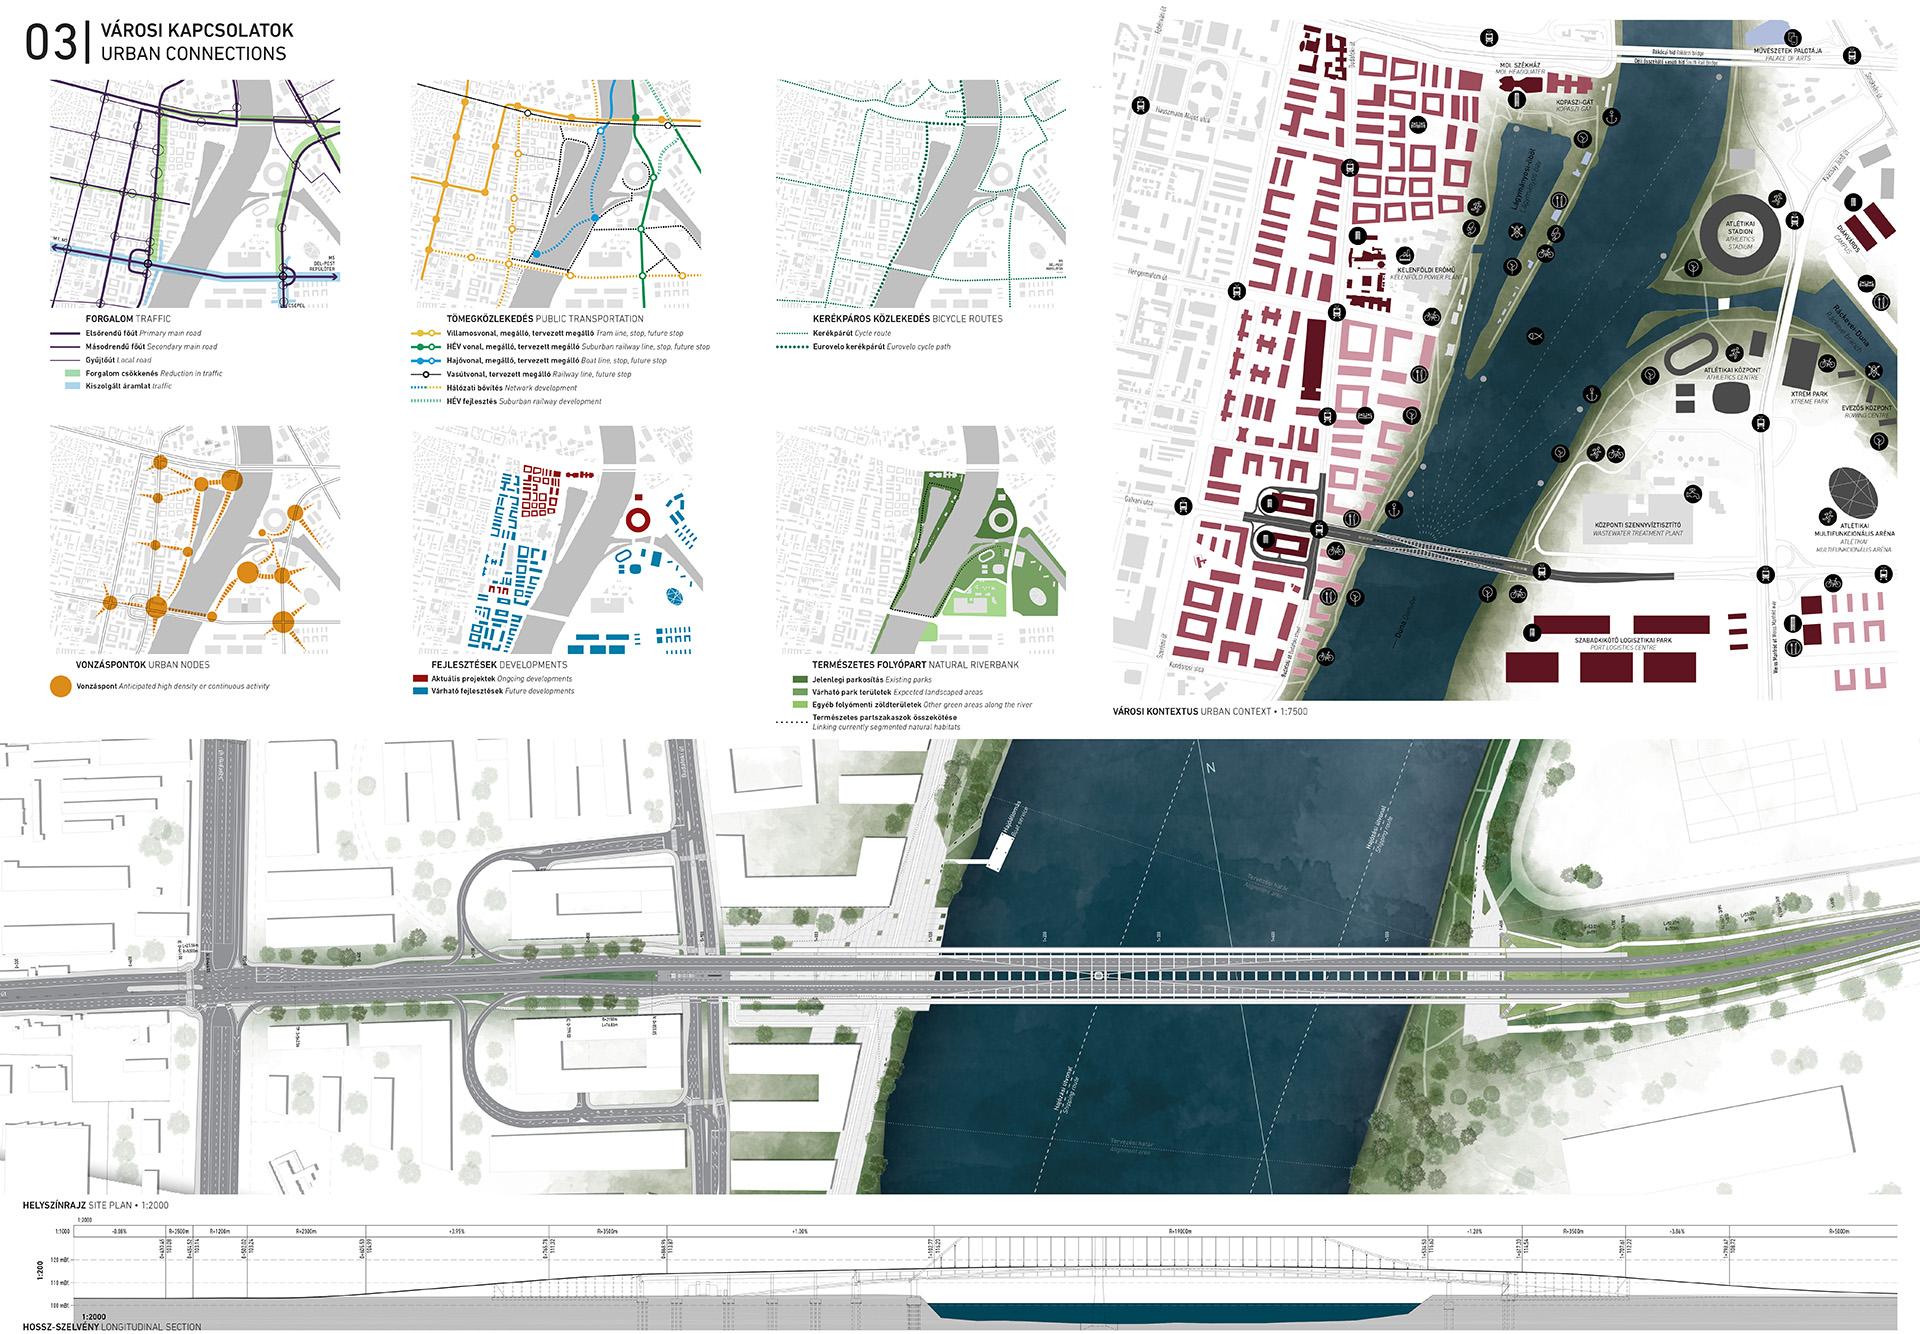 BFS-New-Danube-Bridge-Competition-poster-033.jpg